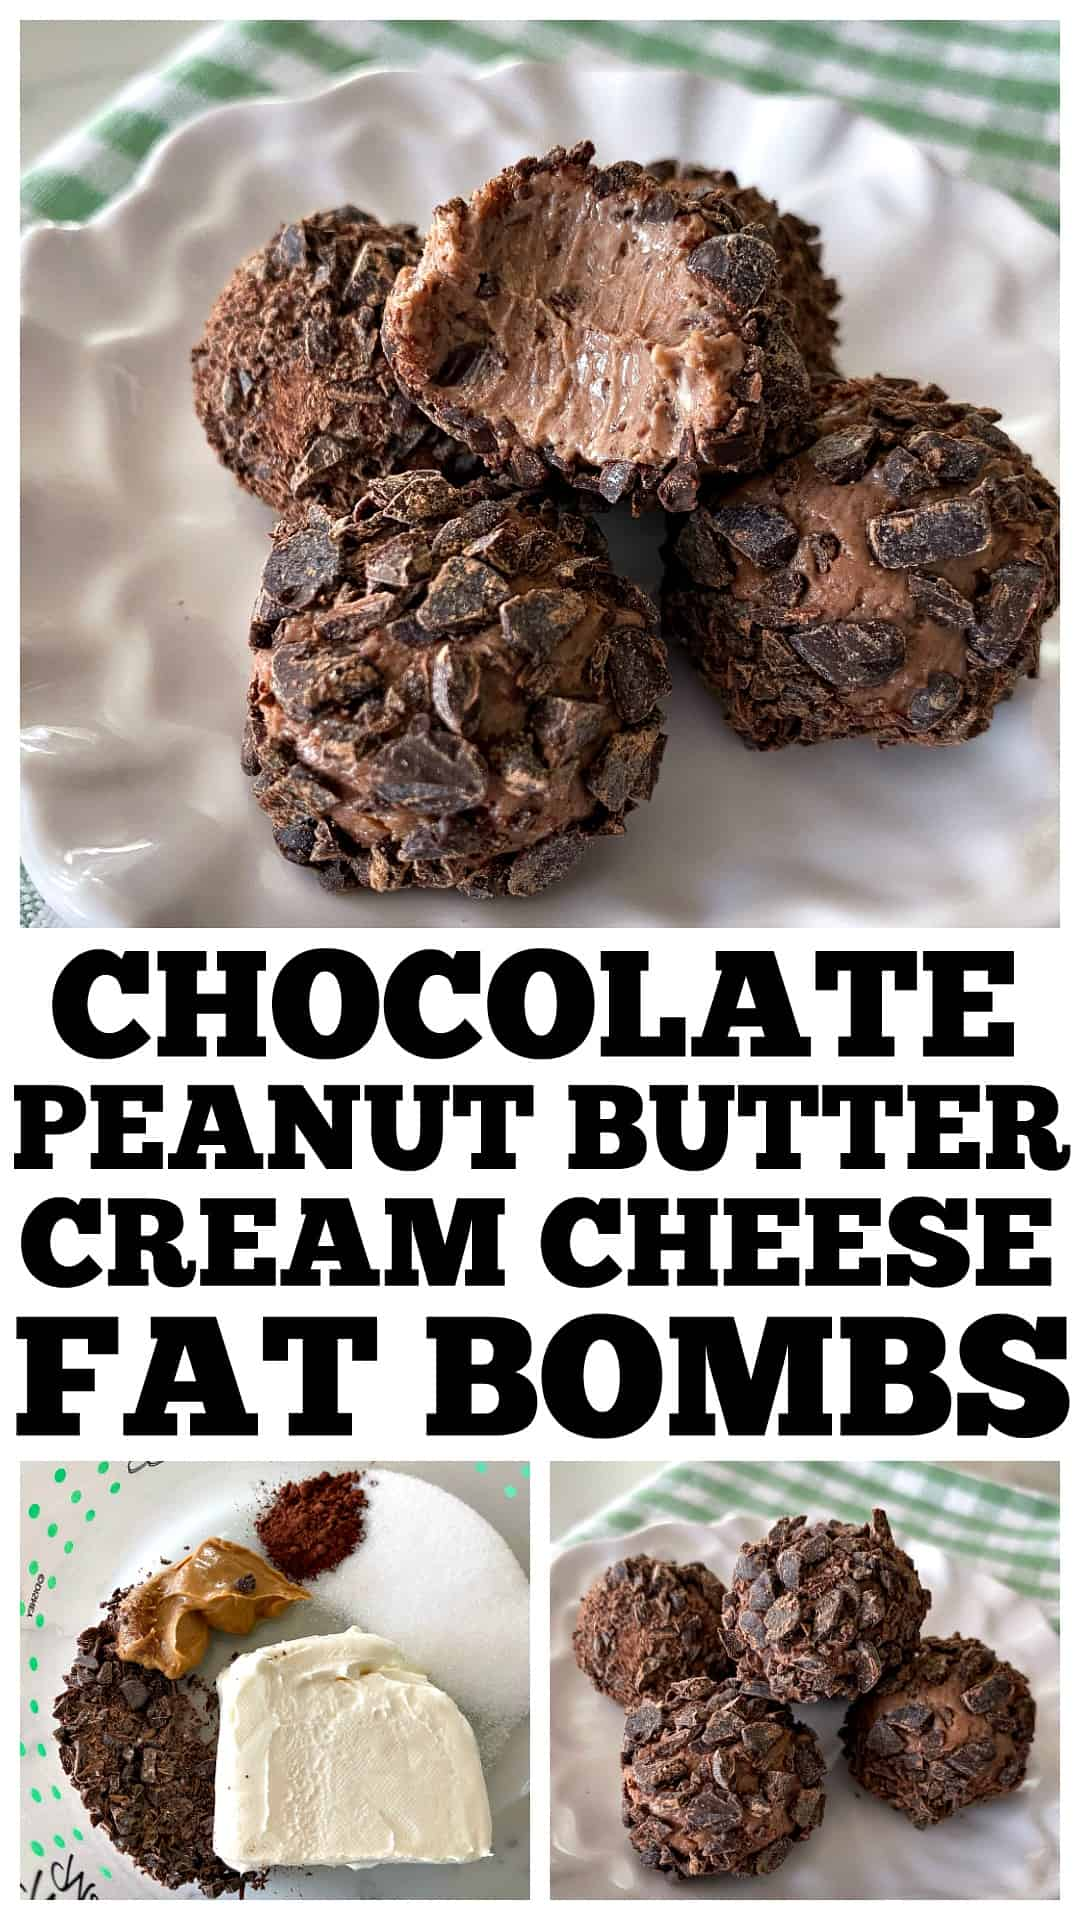 cream cheese fat bombs